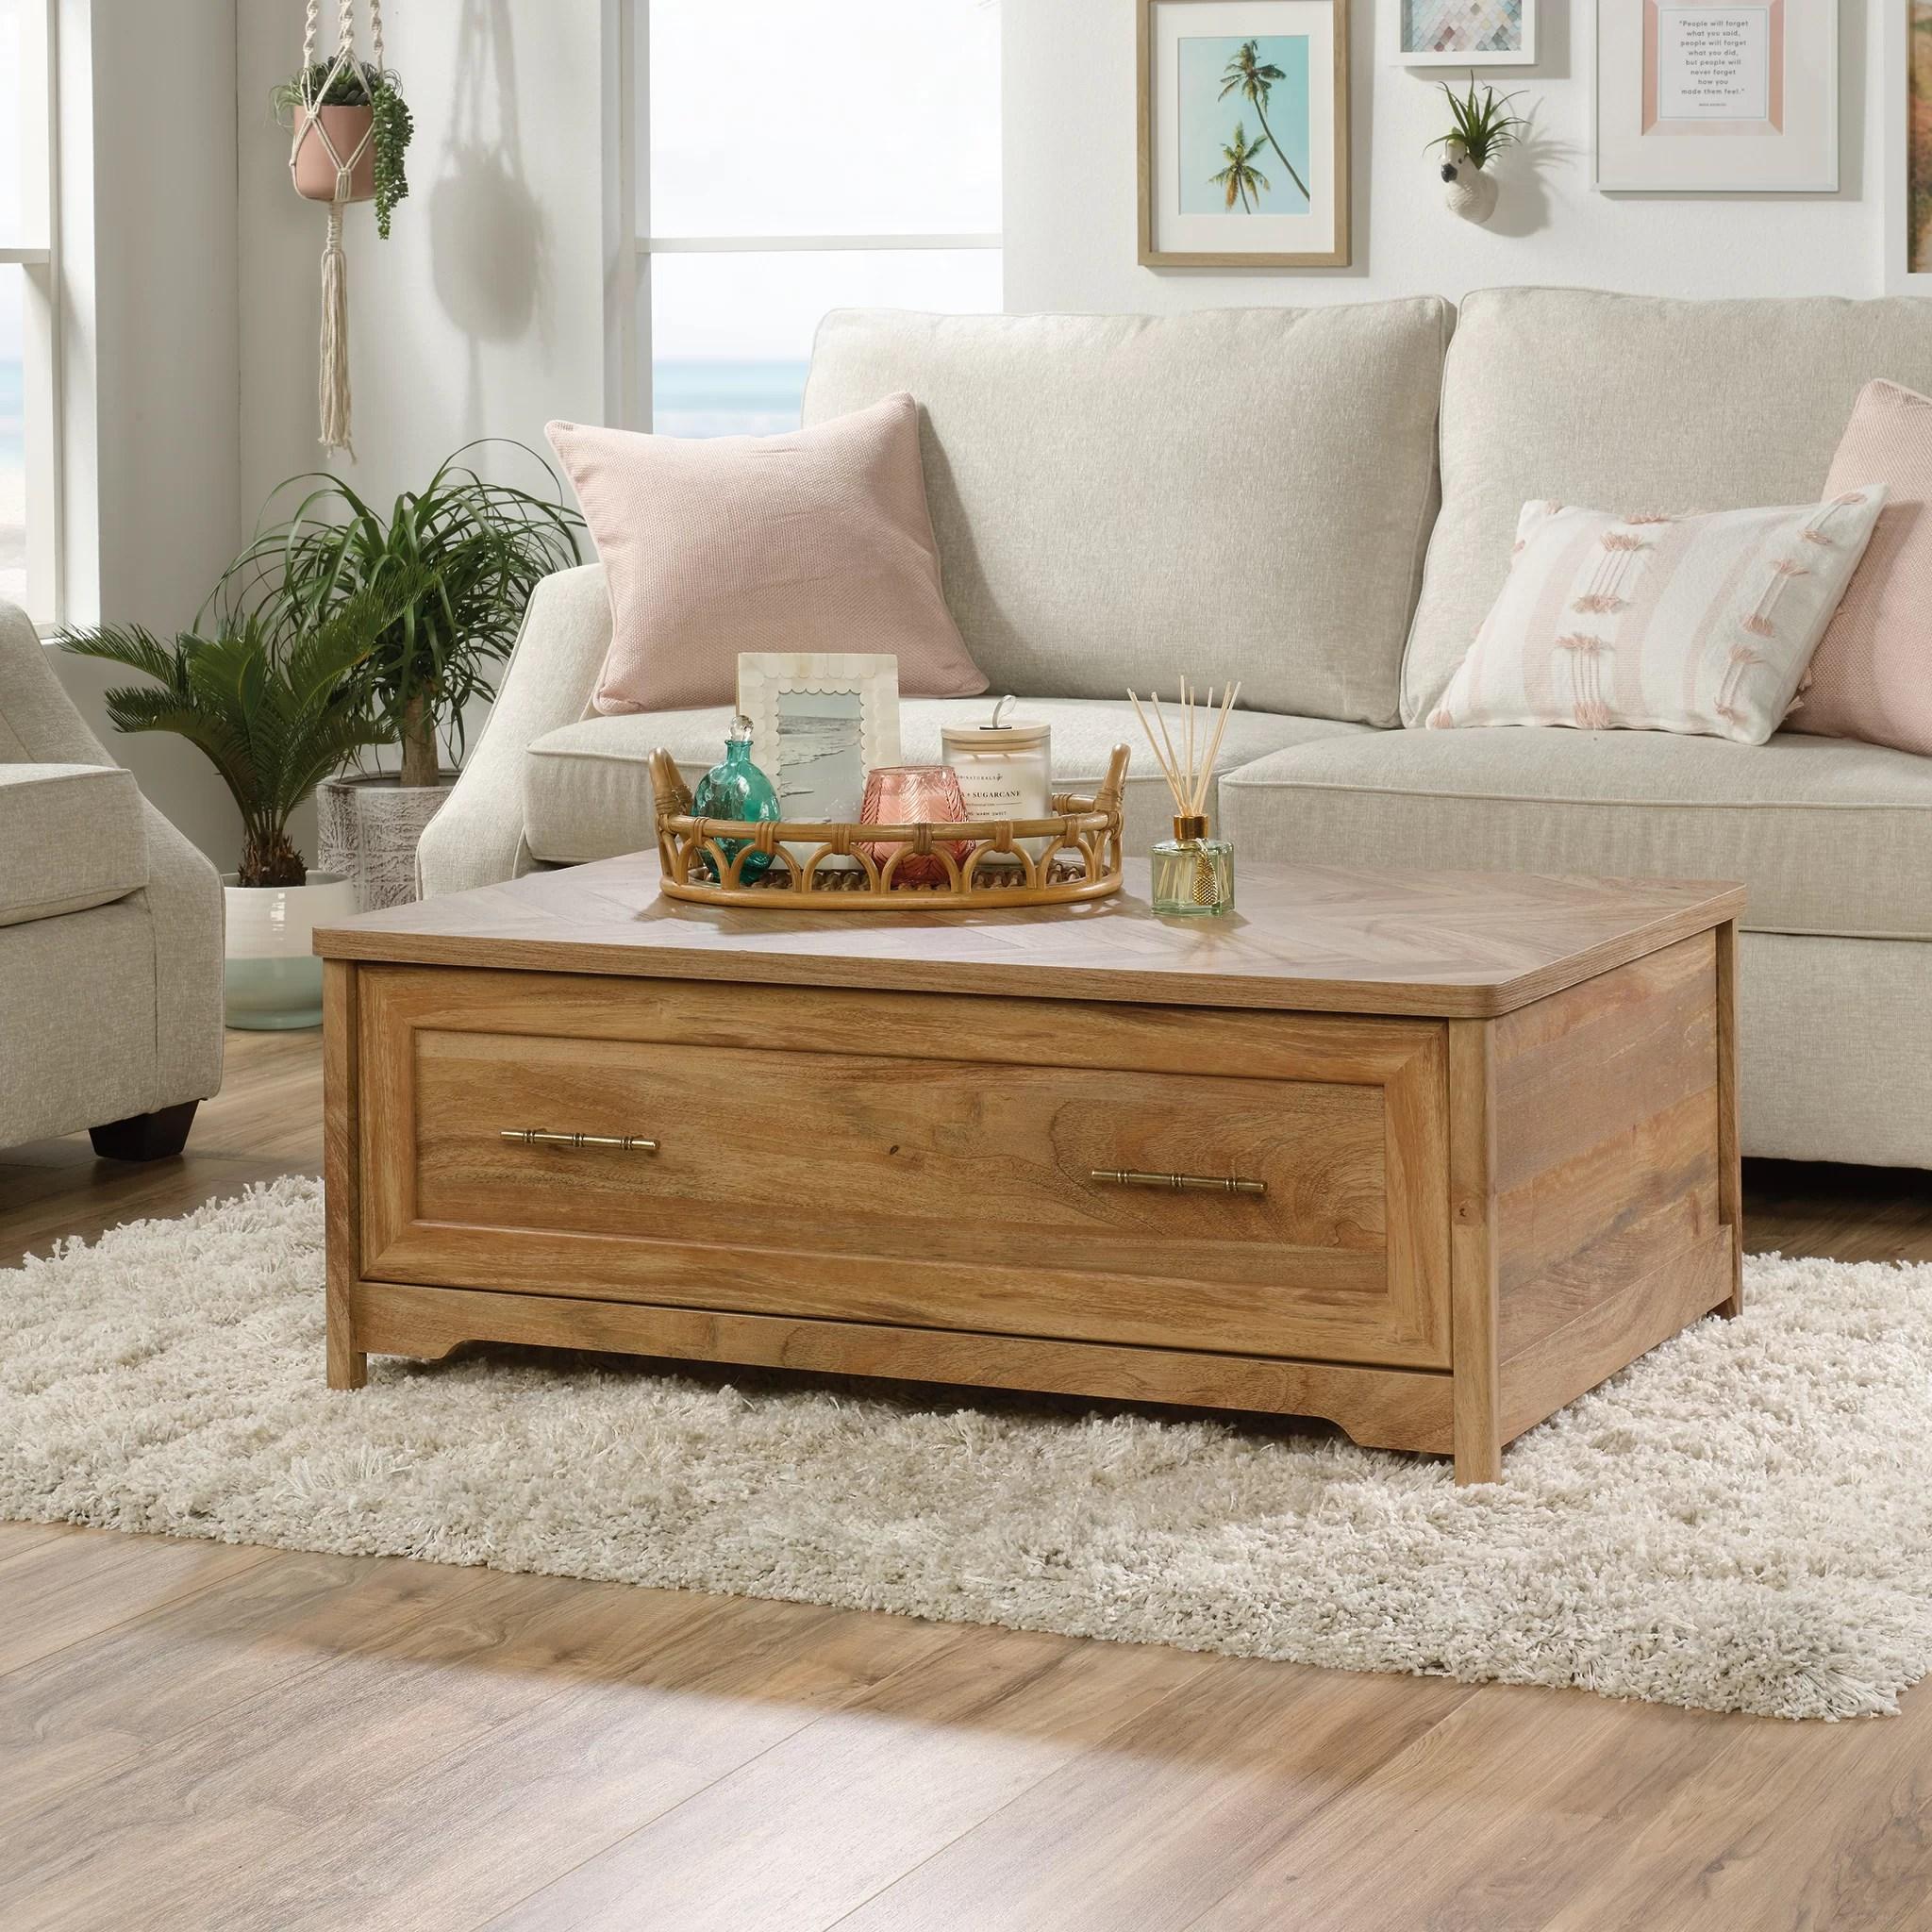 Bay Isle Home Liv Coffee Table With Storage Reviews Wayfair